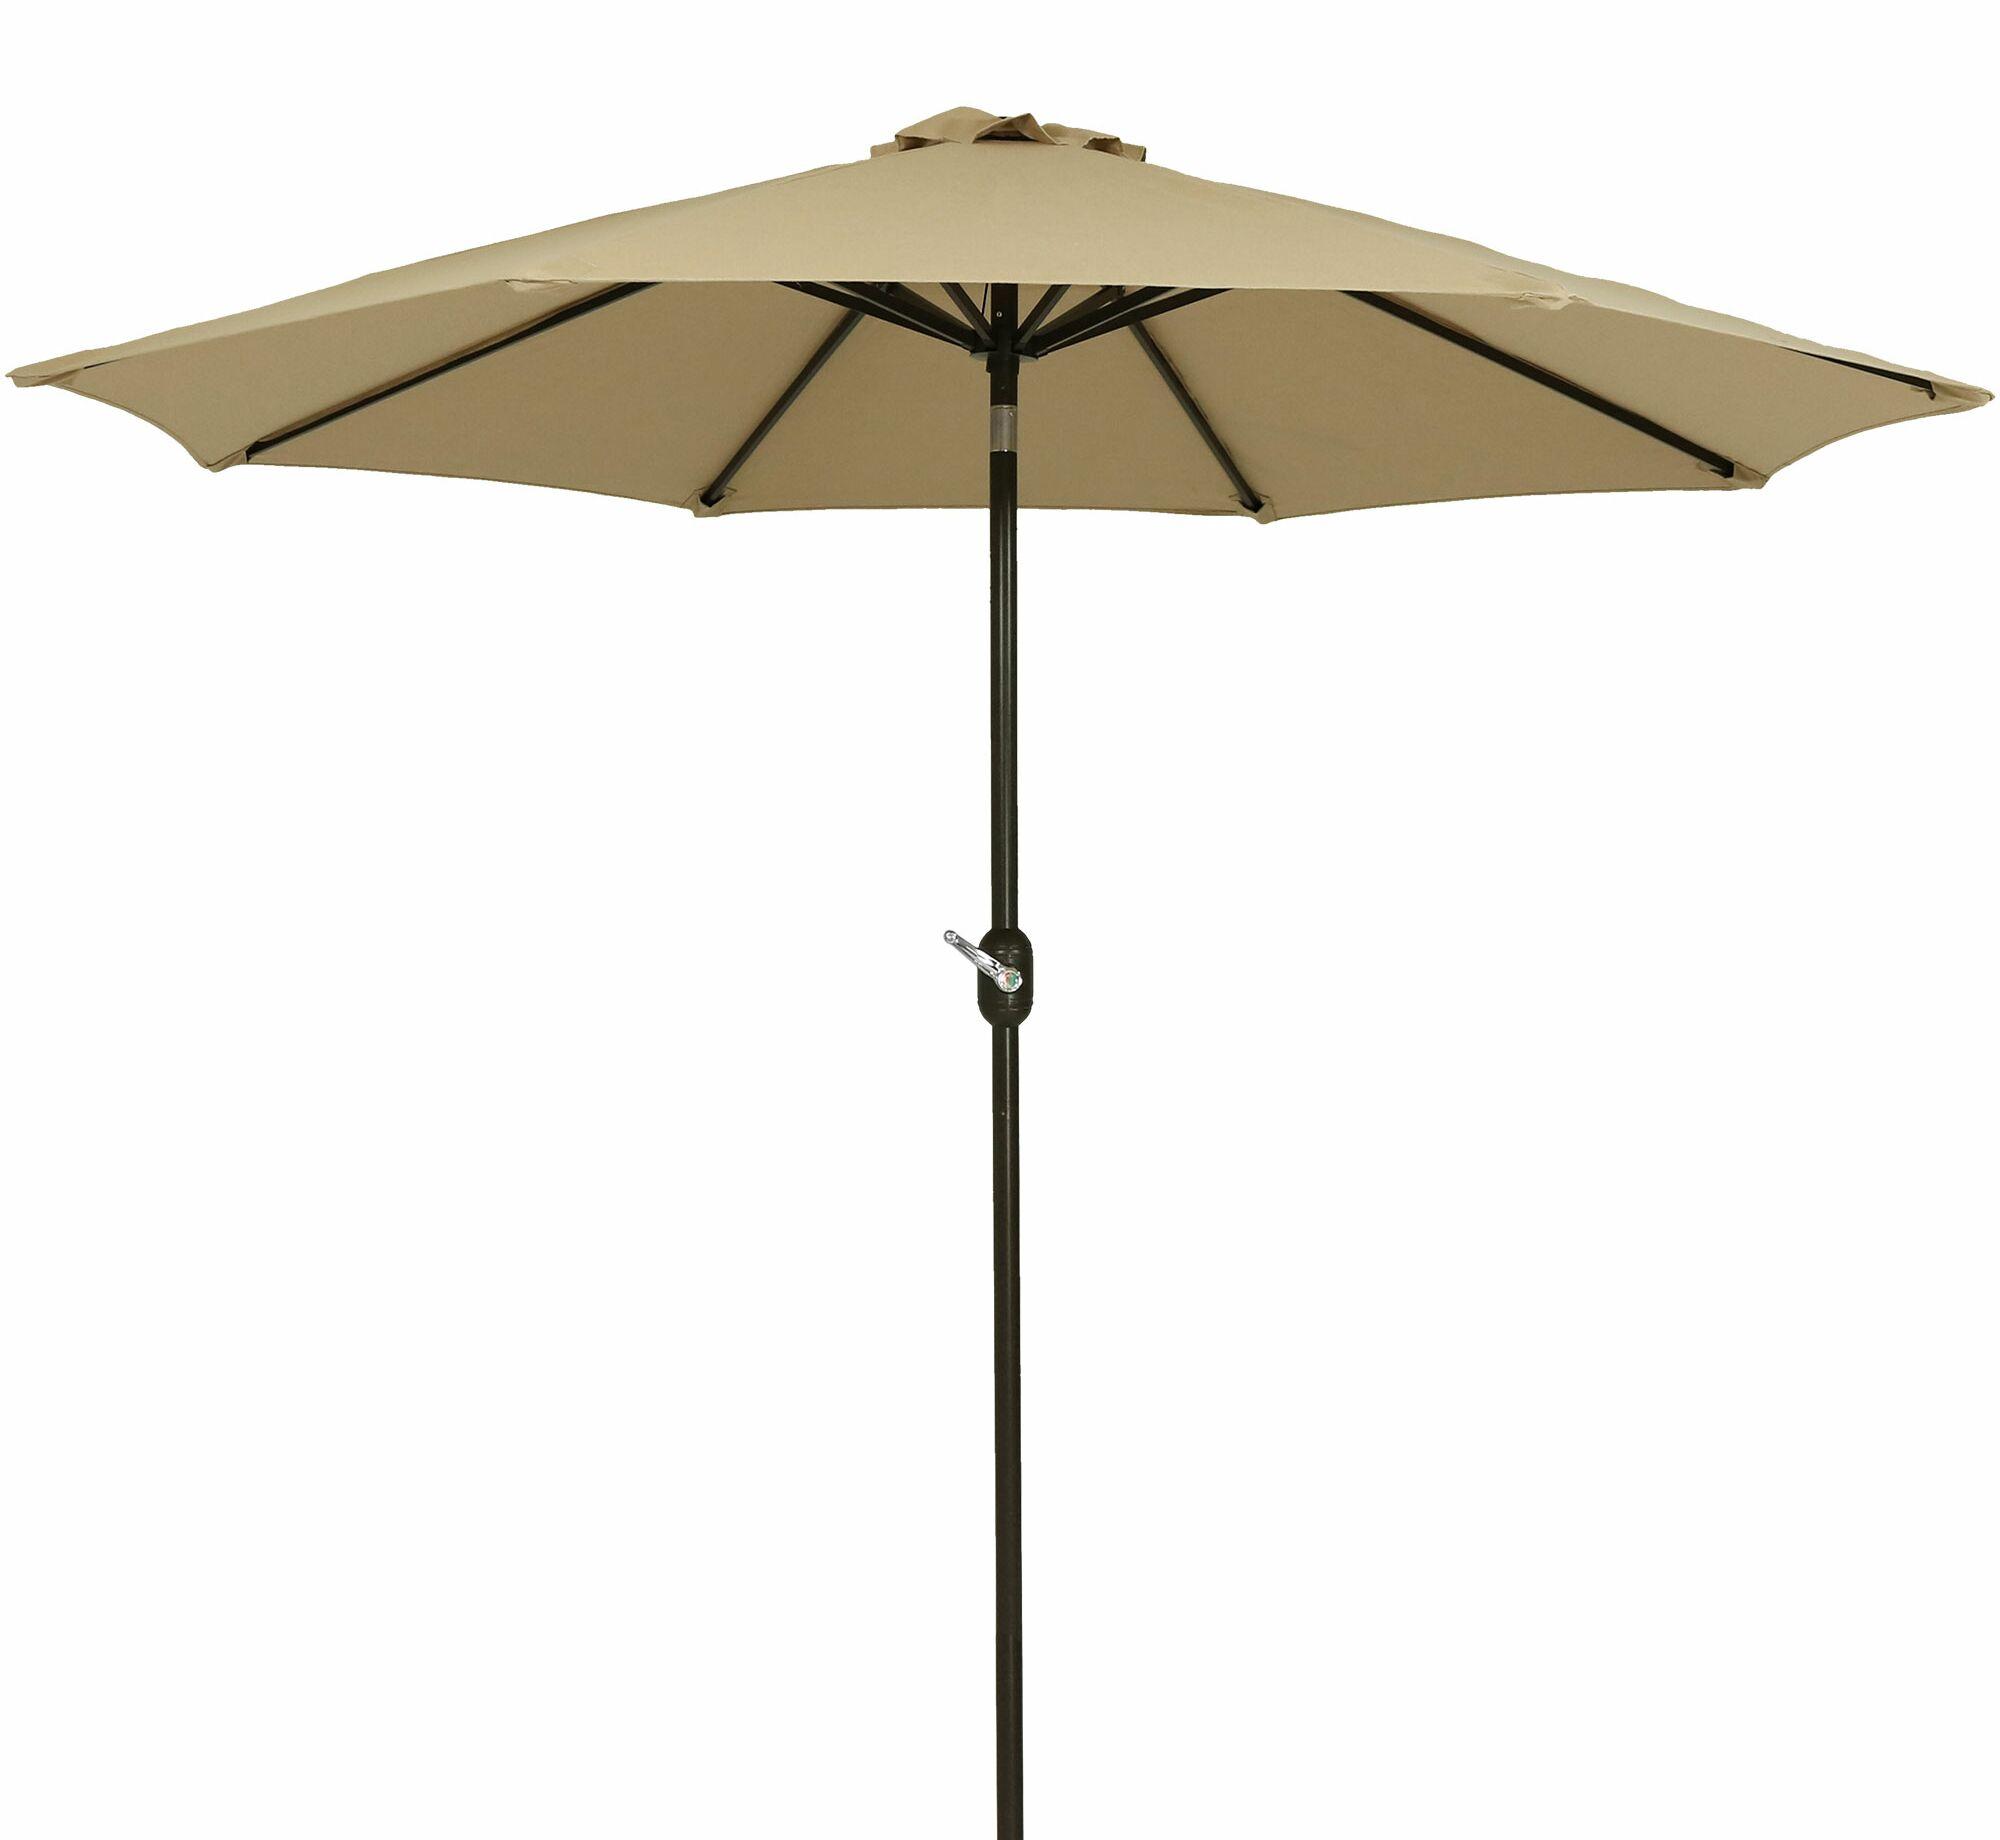 Julian 9' Market Sunbrella Umbrella Fabric Color: Beige